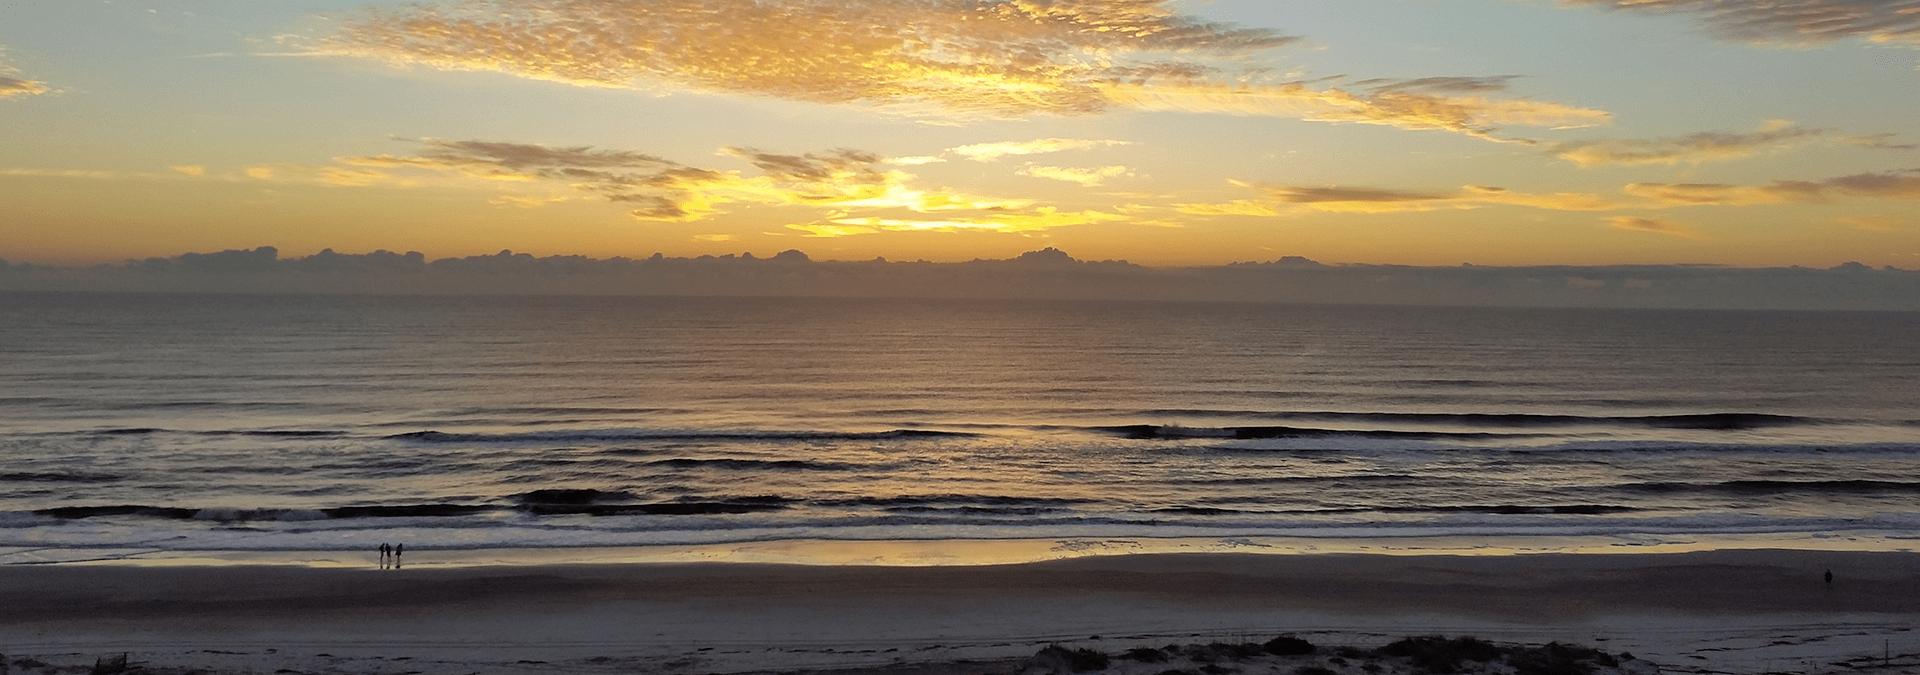 sunset in amelia island fl